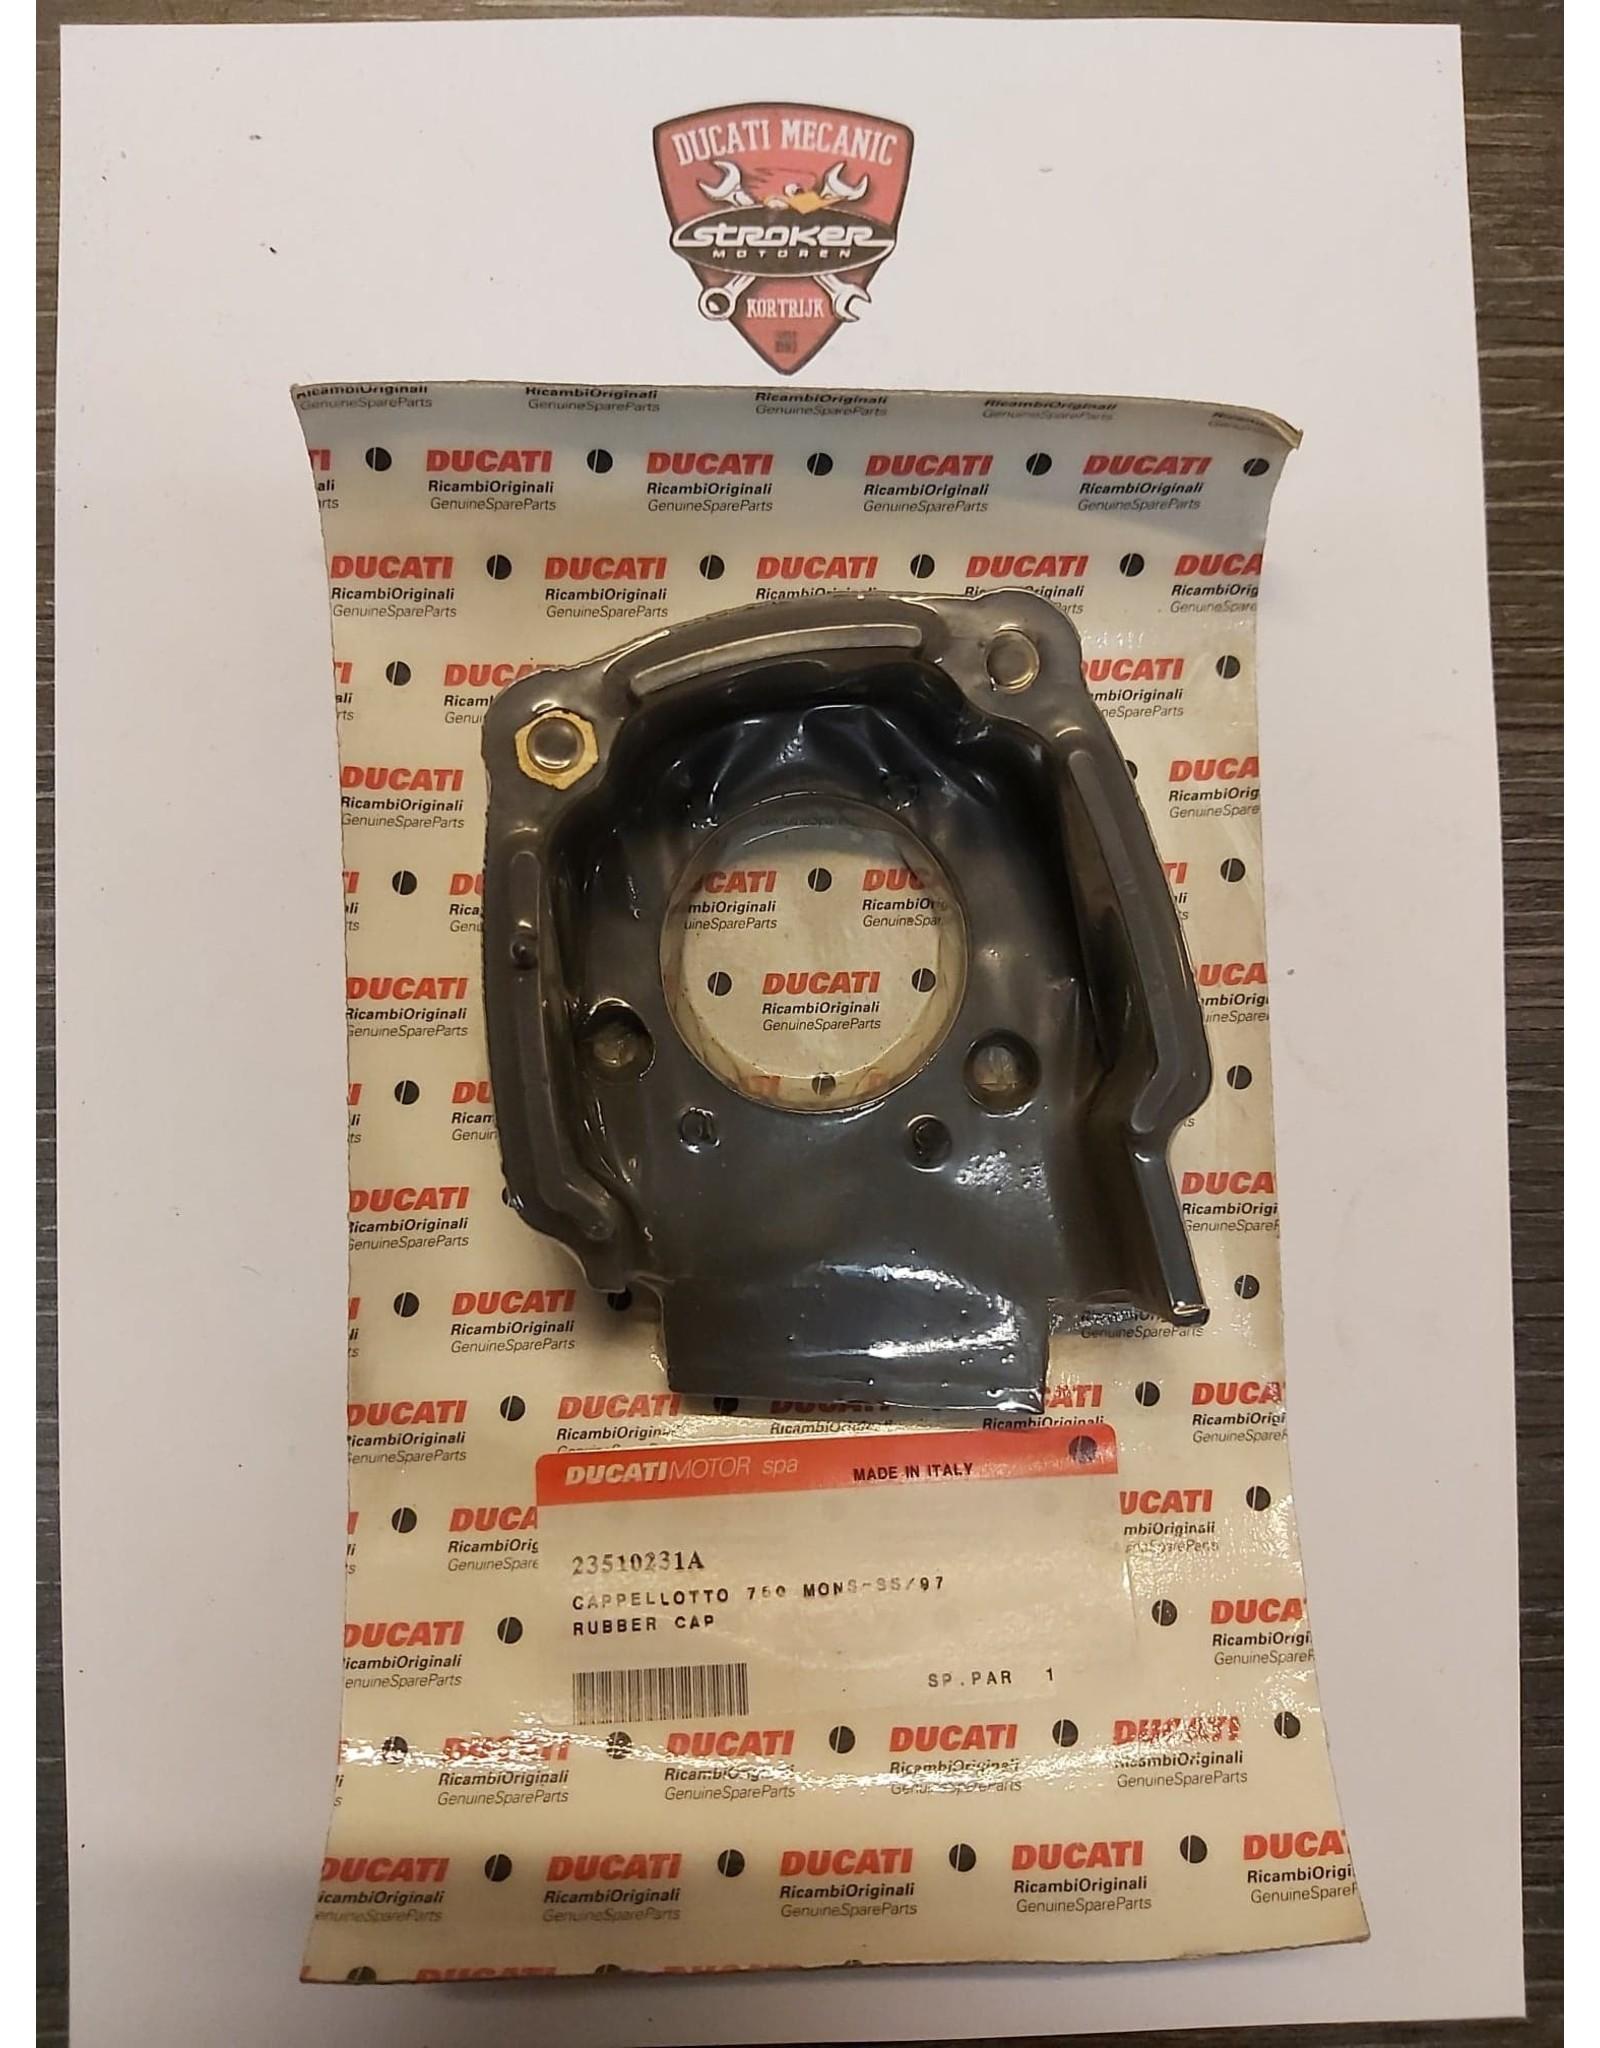 Ducati 23510231A